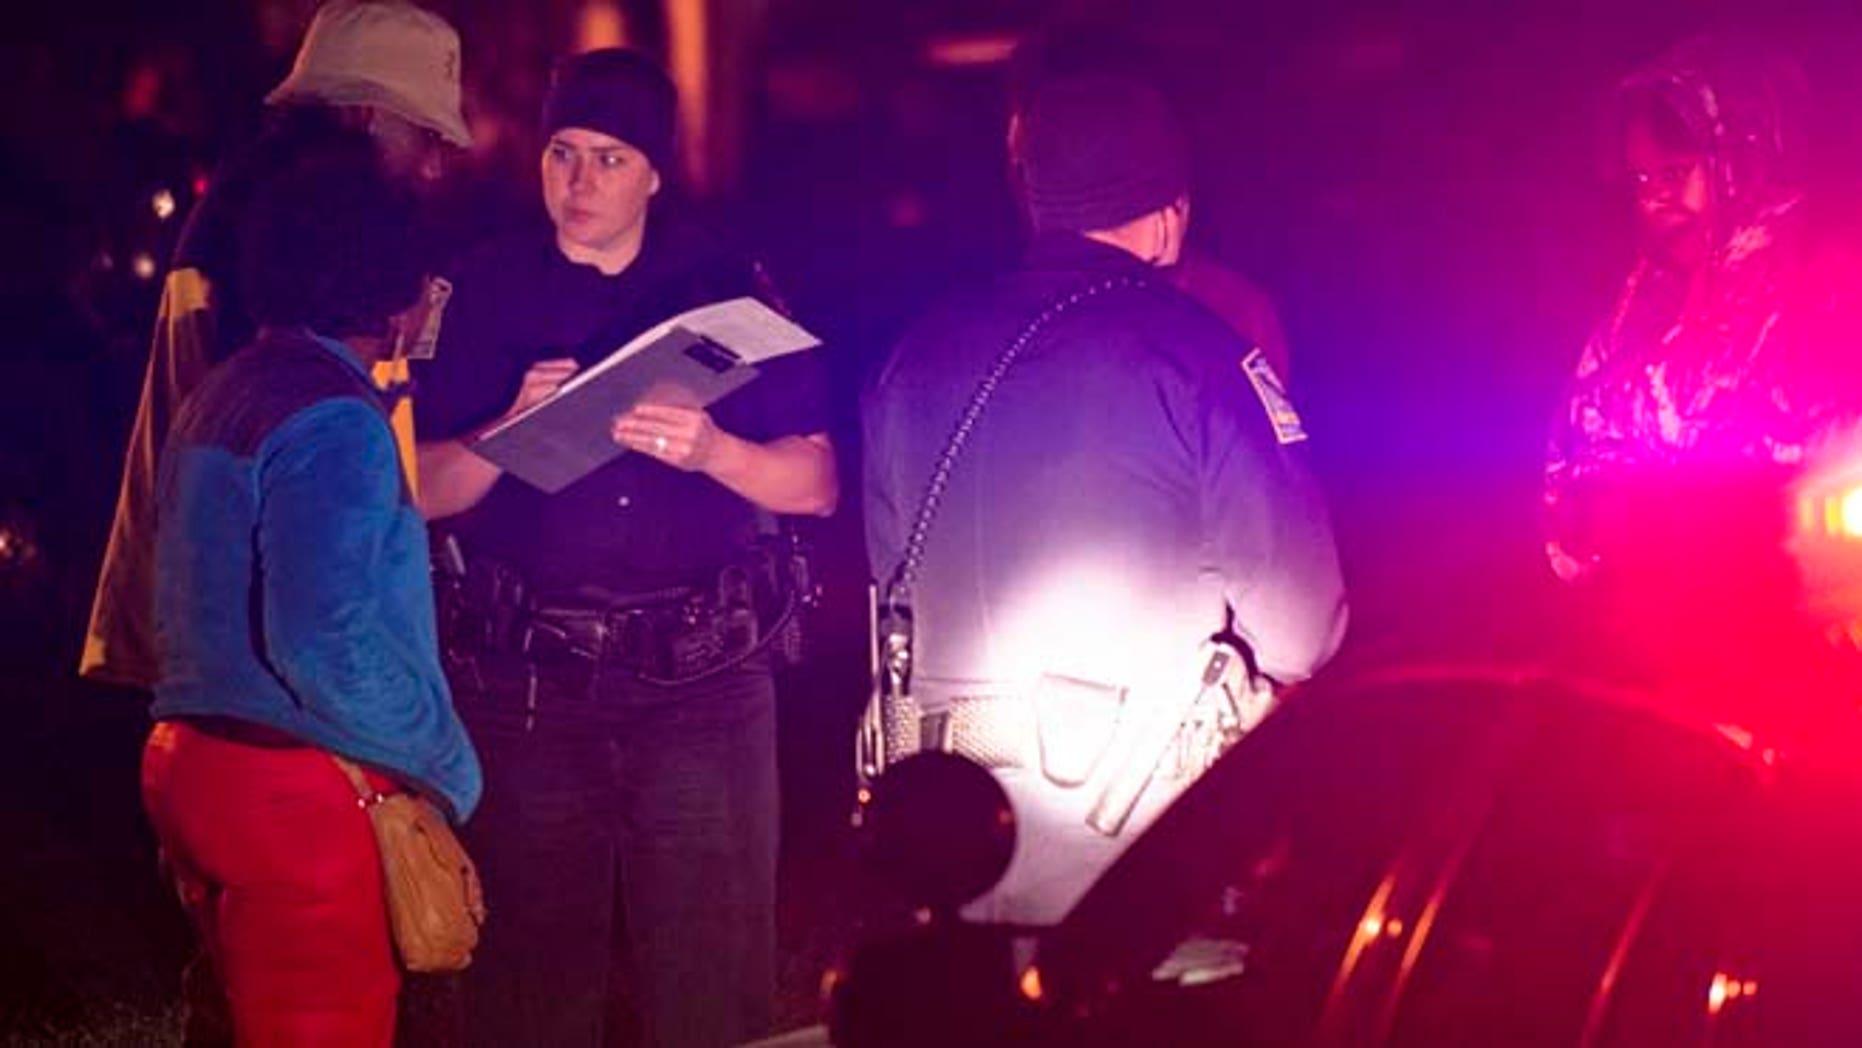 Dec. 14, 2014: Auburn Police investigate a shooting at the Tiger Lodge apartments in Auburn, Ala. (AP/Montgomery Advertiser/Albert Cesare)